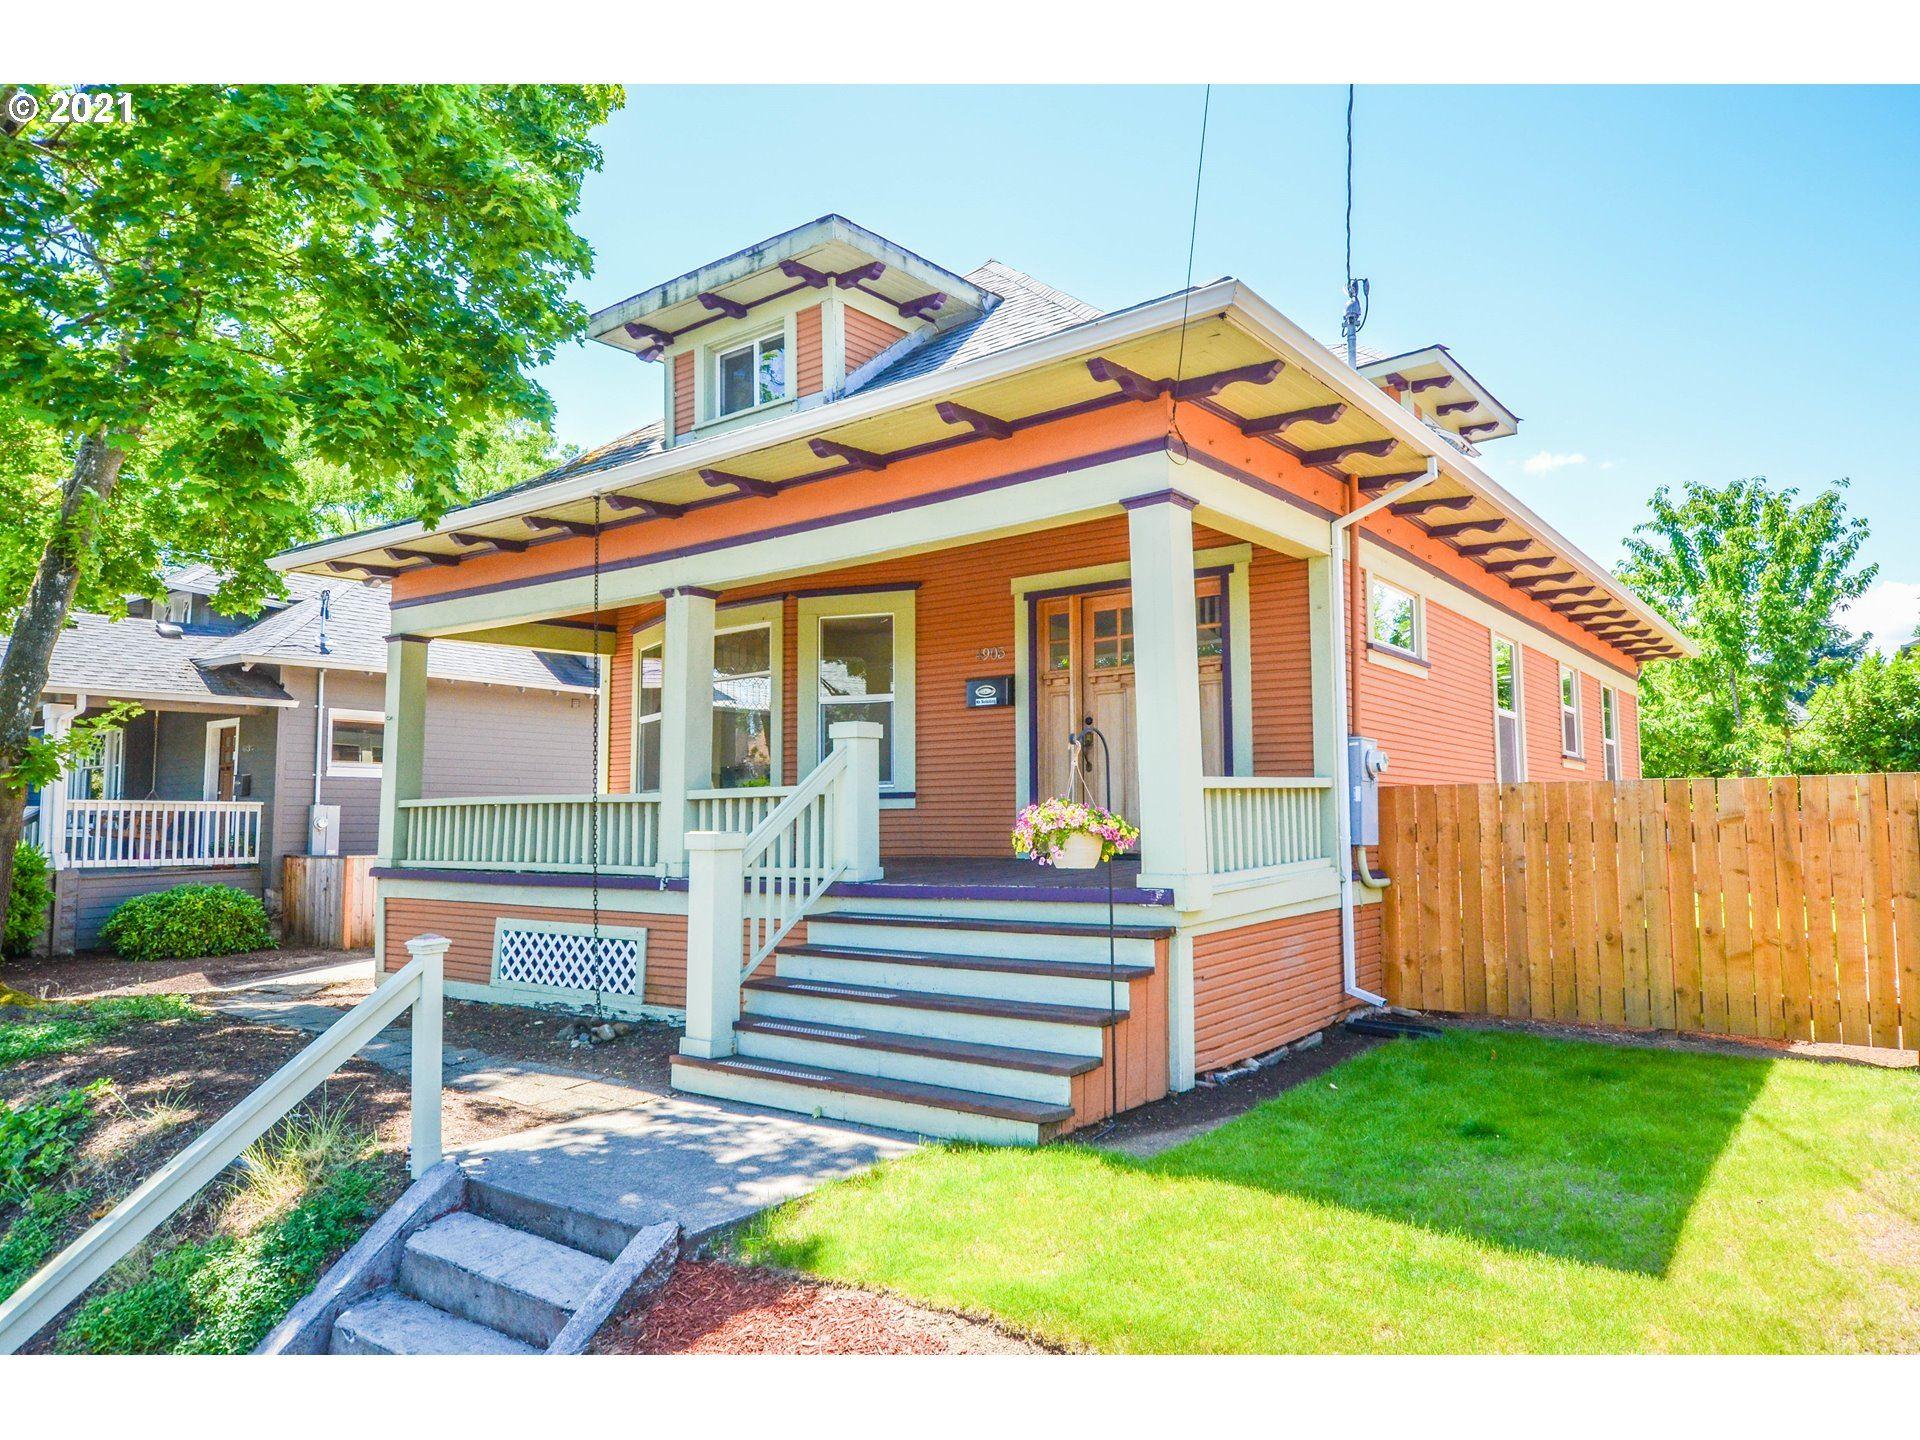 4905 NE 17TH AVE, Portland, OR 97211 - MLS#: 21002925